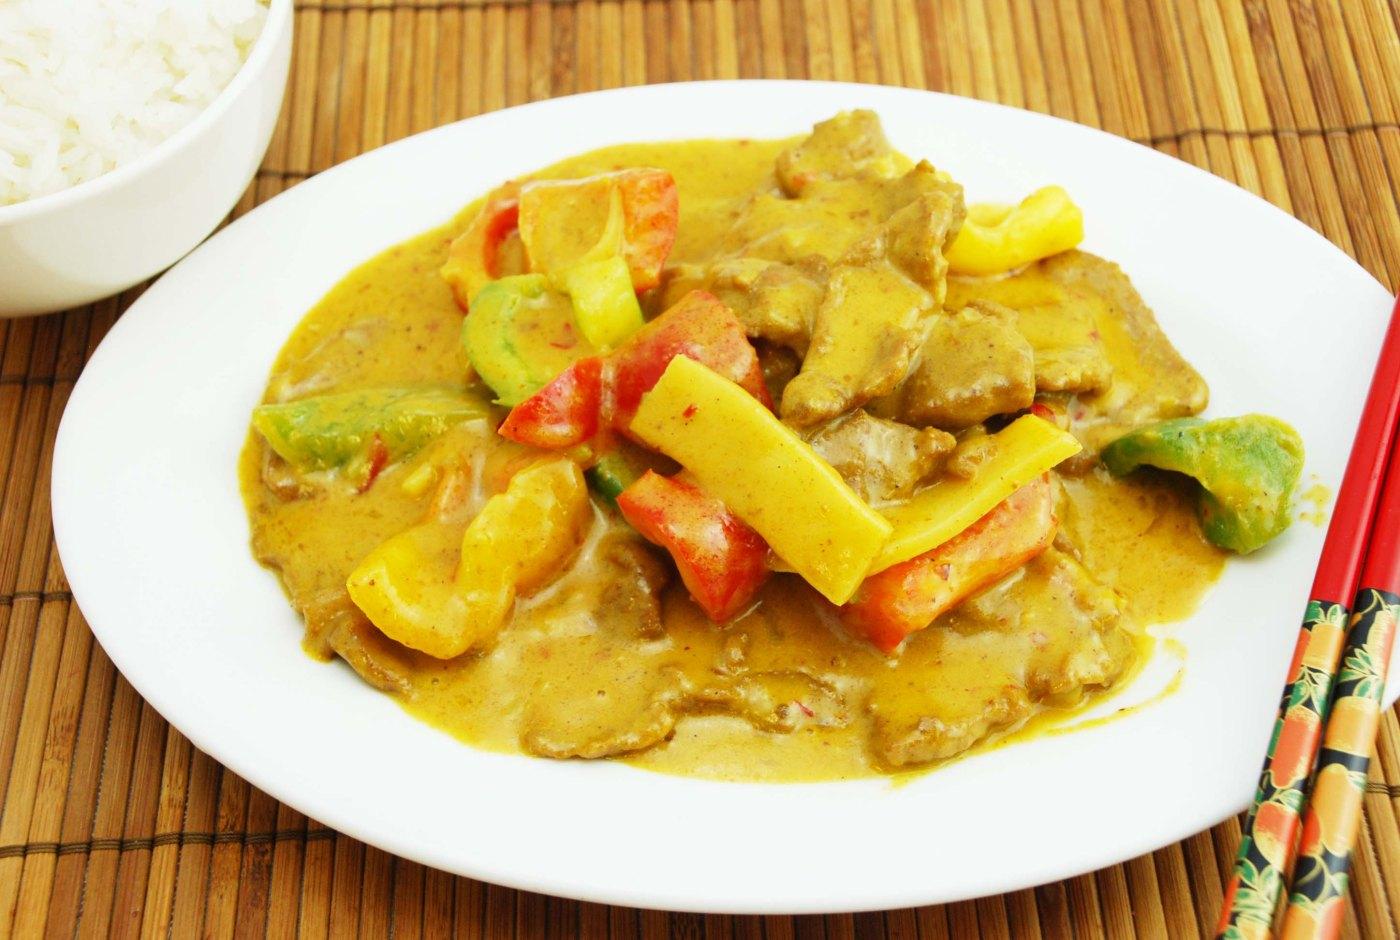 Meilleure cuisine asiatique sur Abidjan, serialfoodie, classement, critique culinaire, serialfoodie, abidjan côte d'ivoire